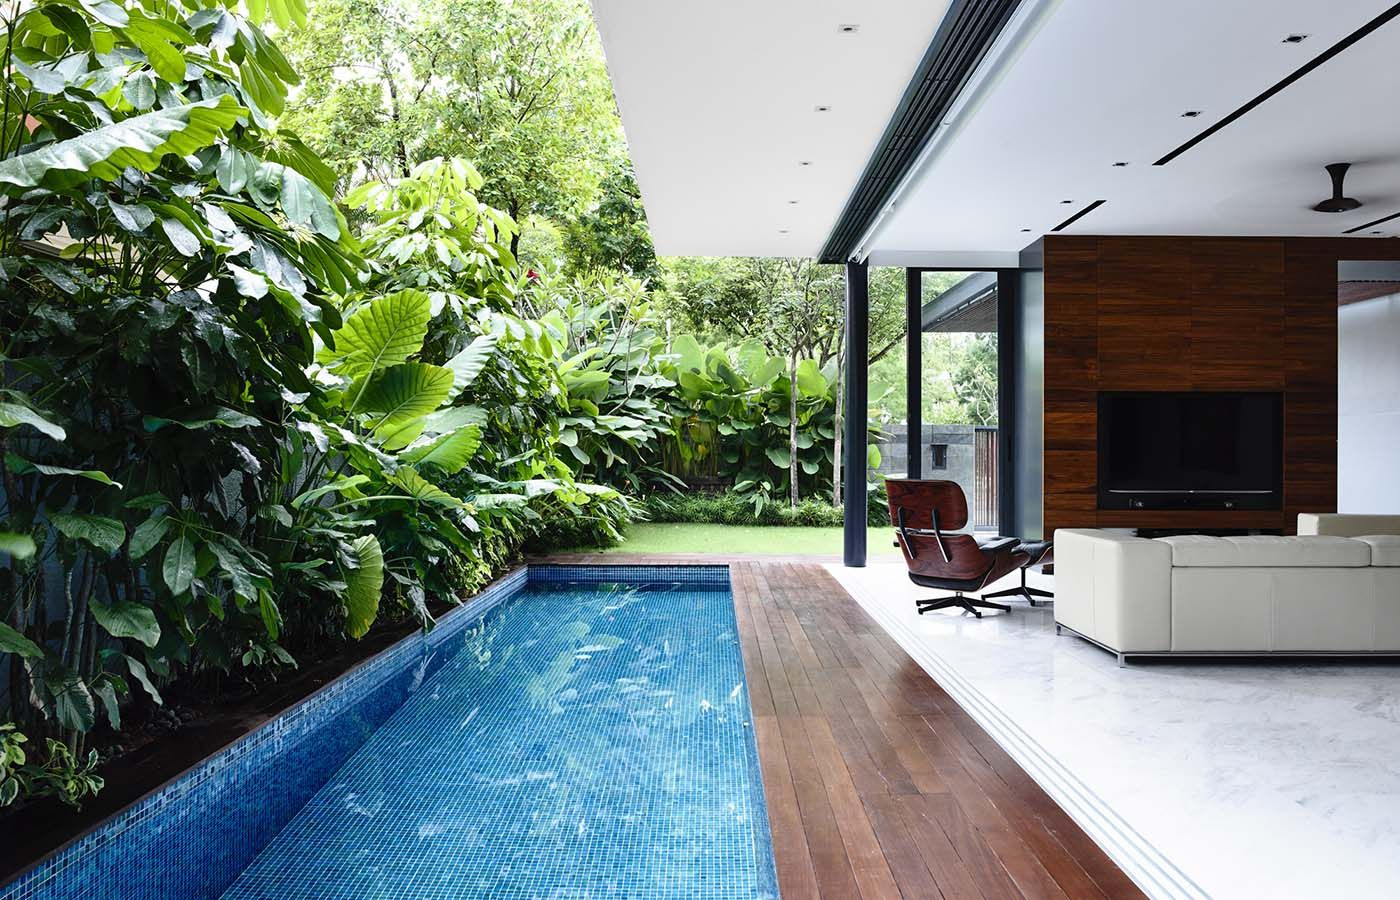 Hyla Architects Award Winning Singapore Architect Firm Pool Houses Indoor Swimming Pool Design Backyard Pool Designs